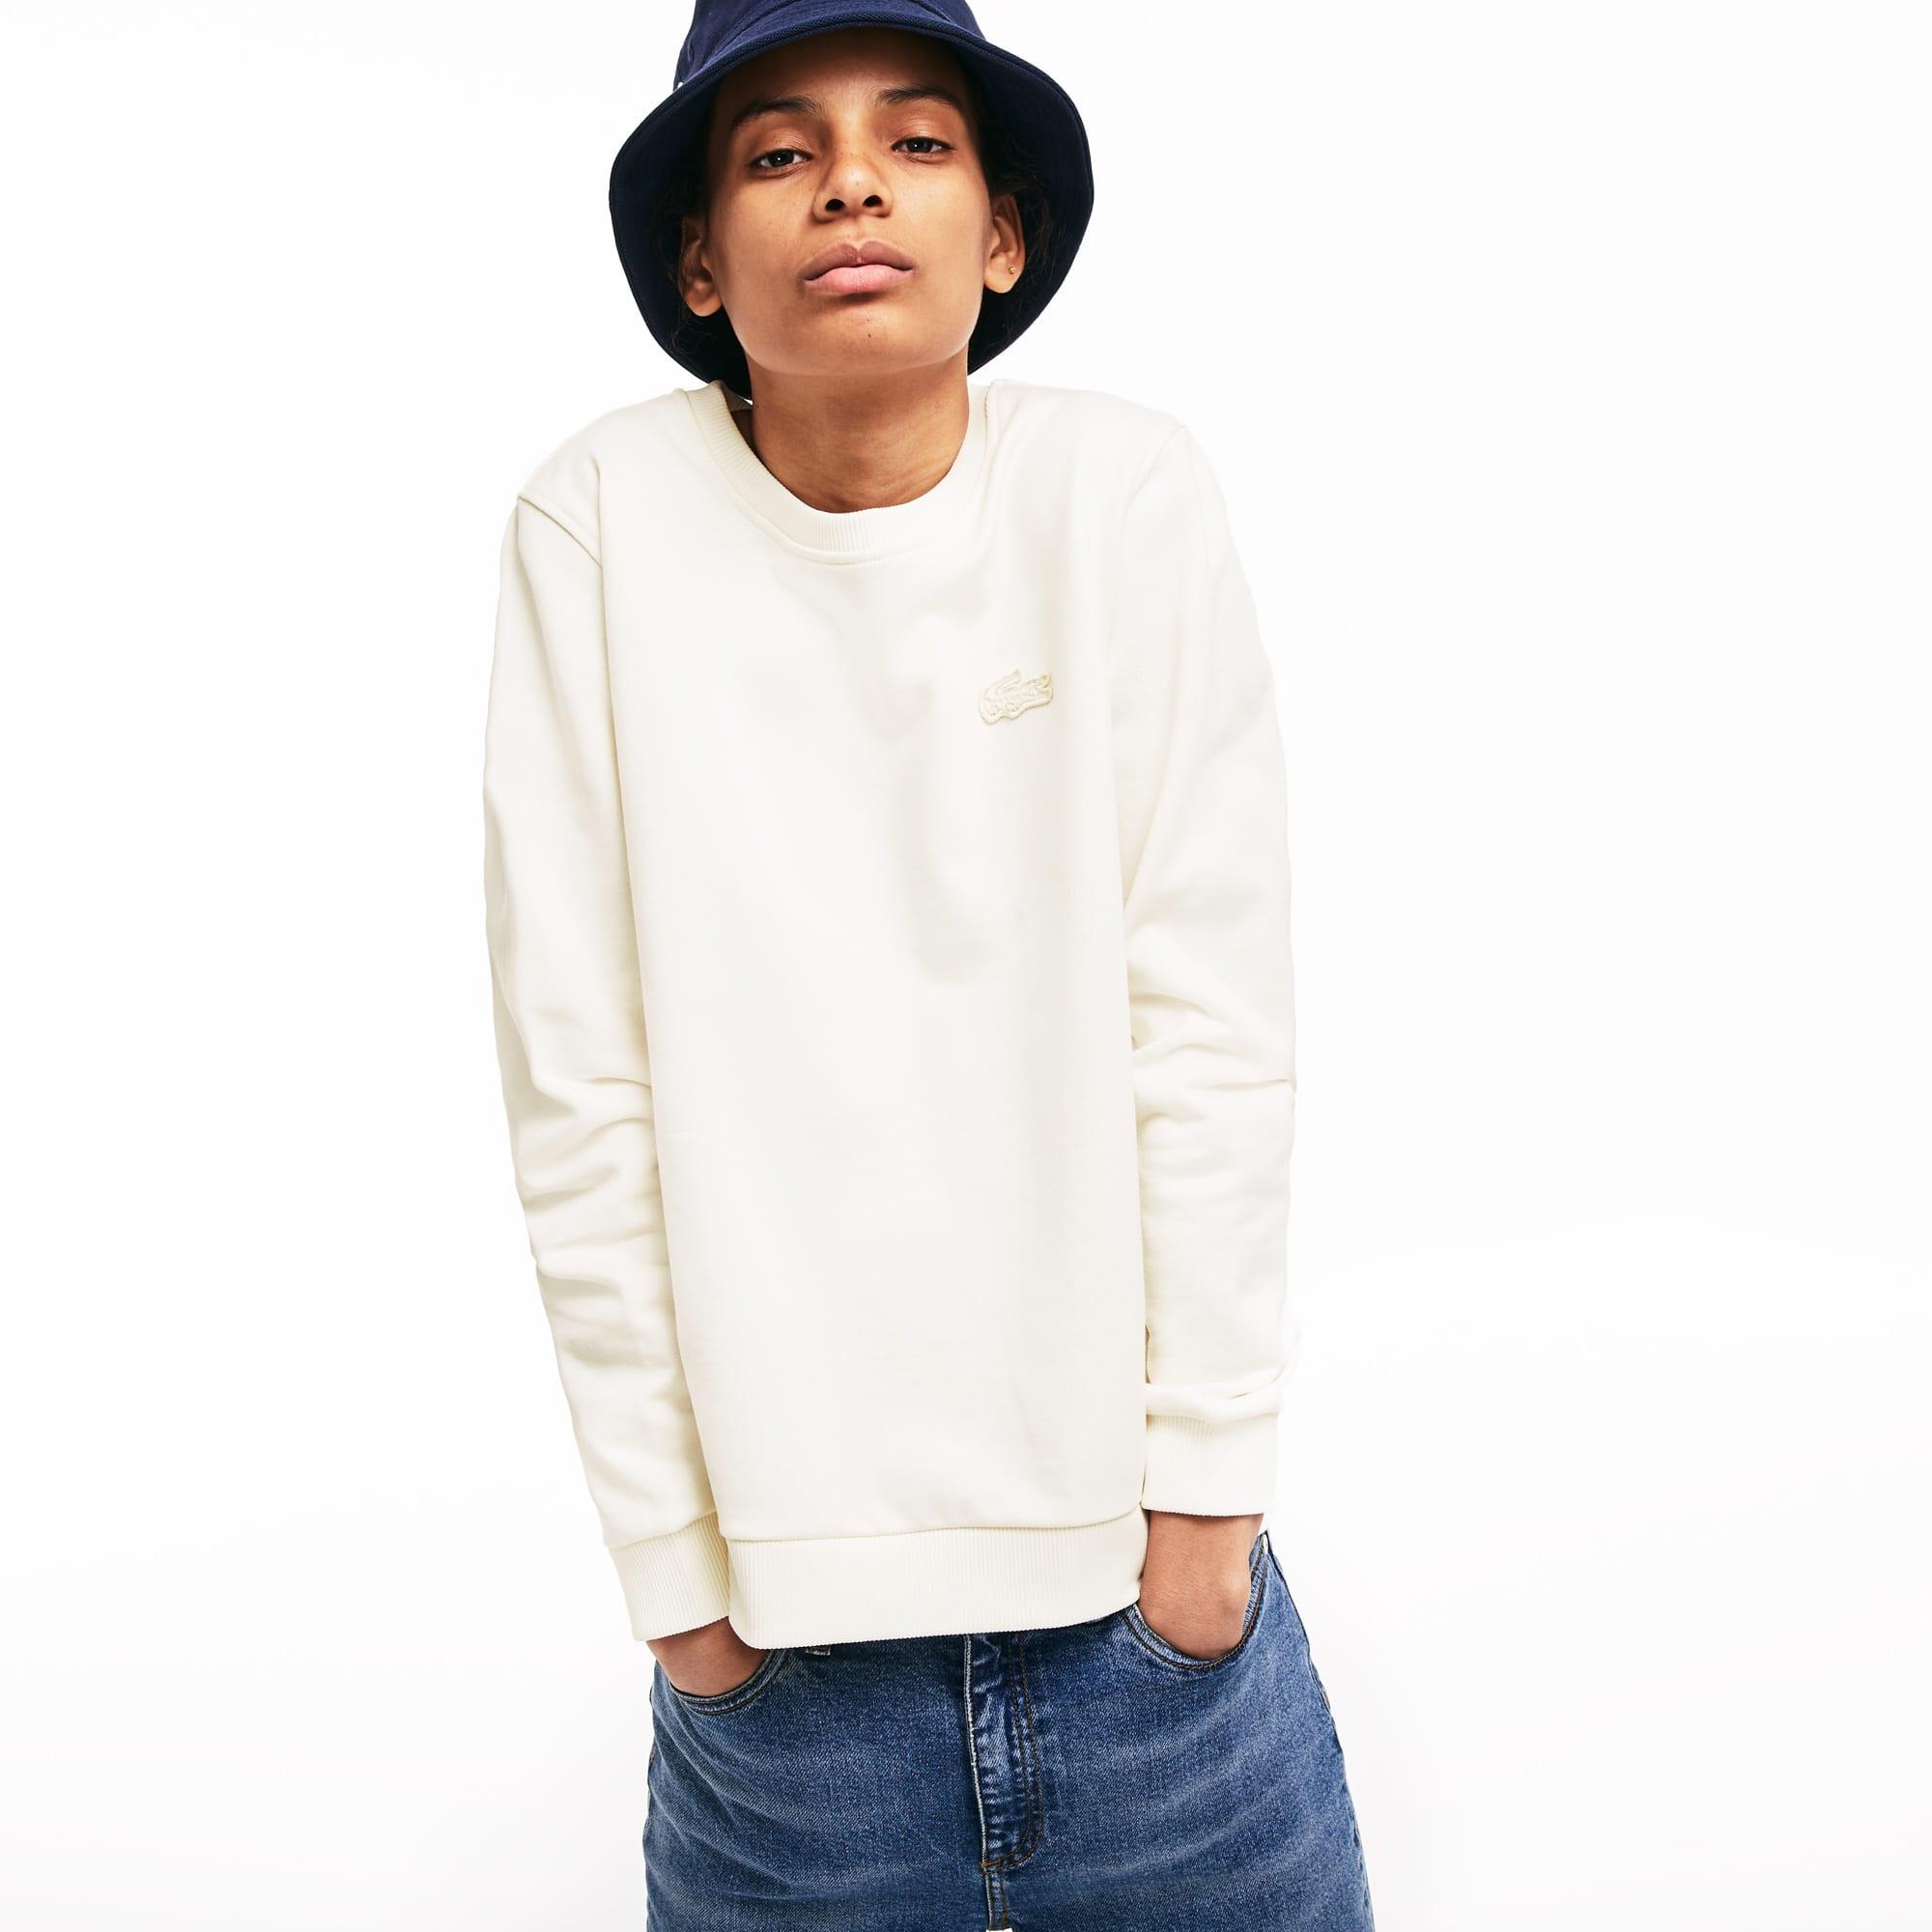 cb6dccbd2 Sweaters and Sweatshirts